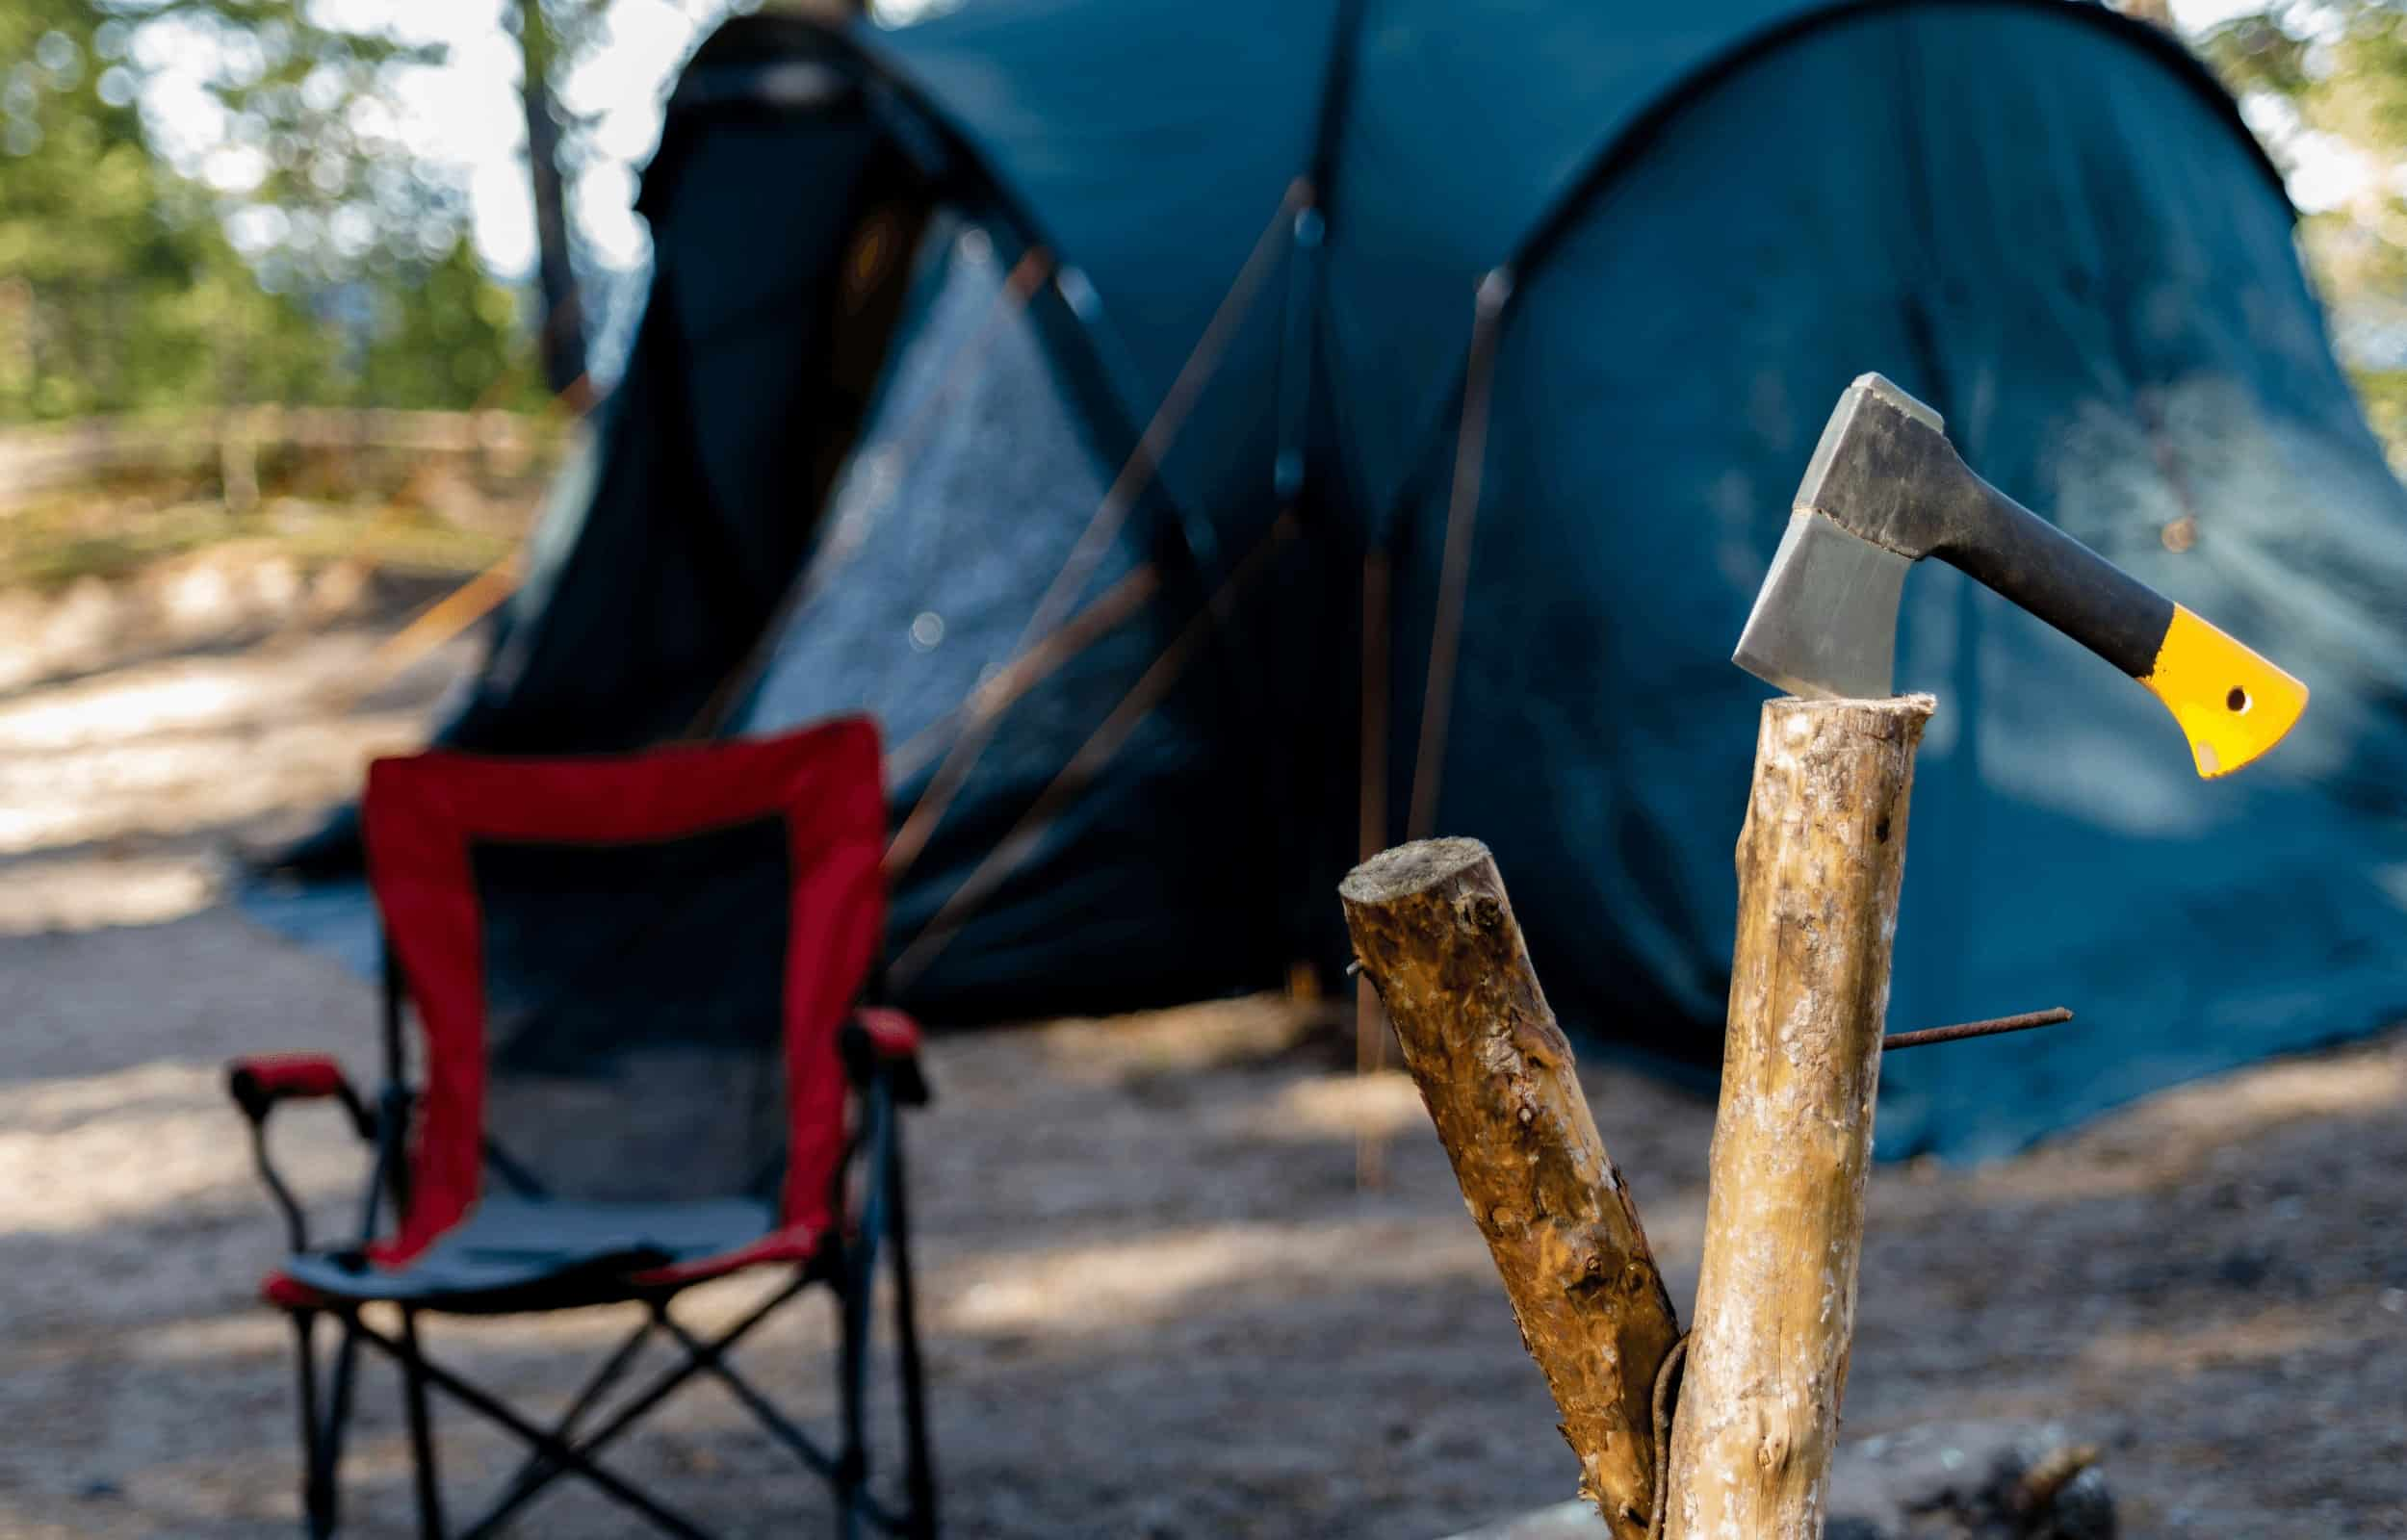 best backpacking hatchet opt outdoor camping hatchet cutting wood best axe